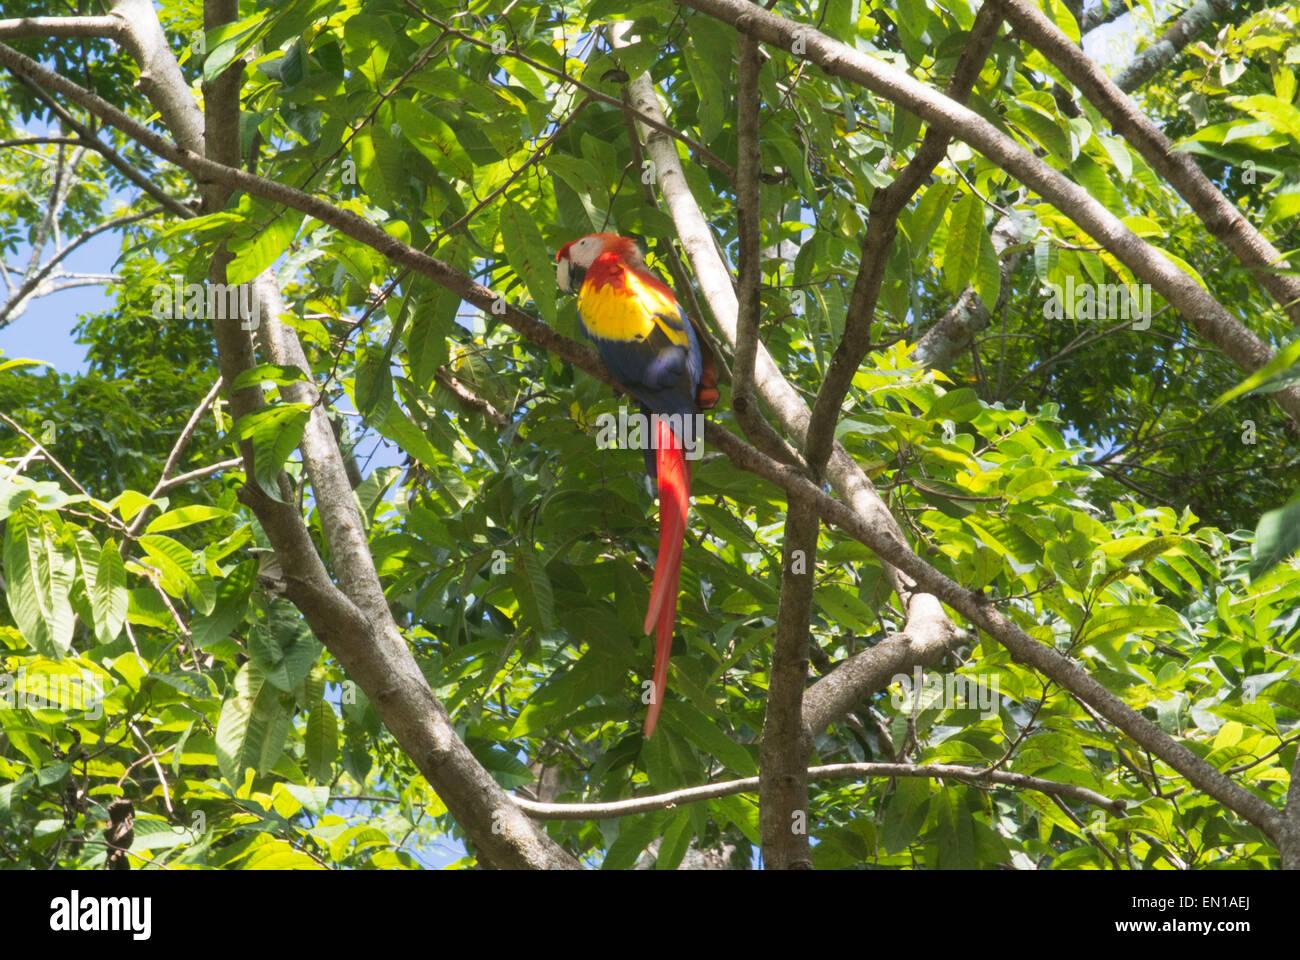 Scarlet Macaw, national bird of Honduras, Copan, Honduras - Stock Image